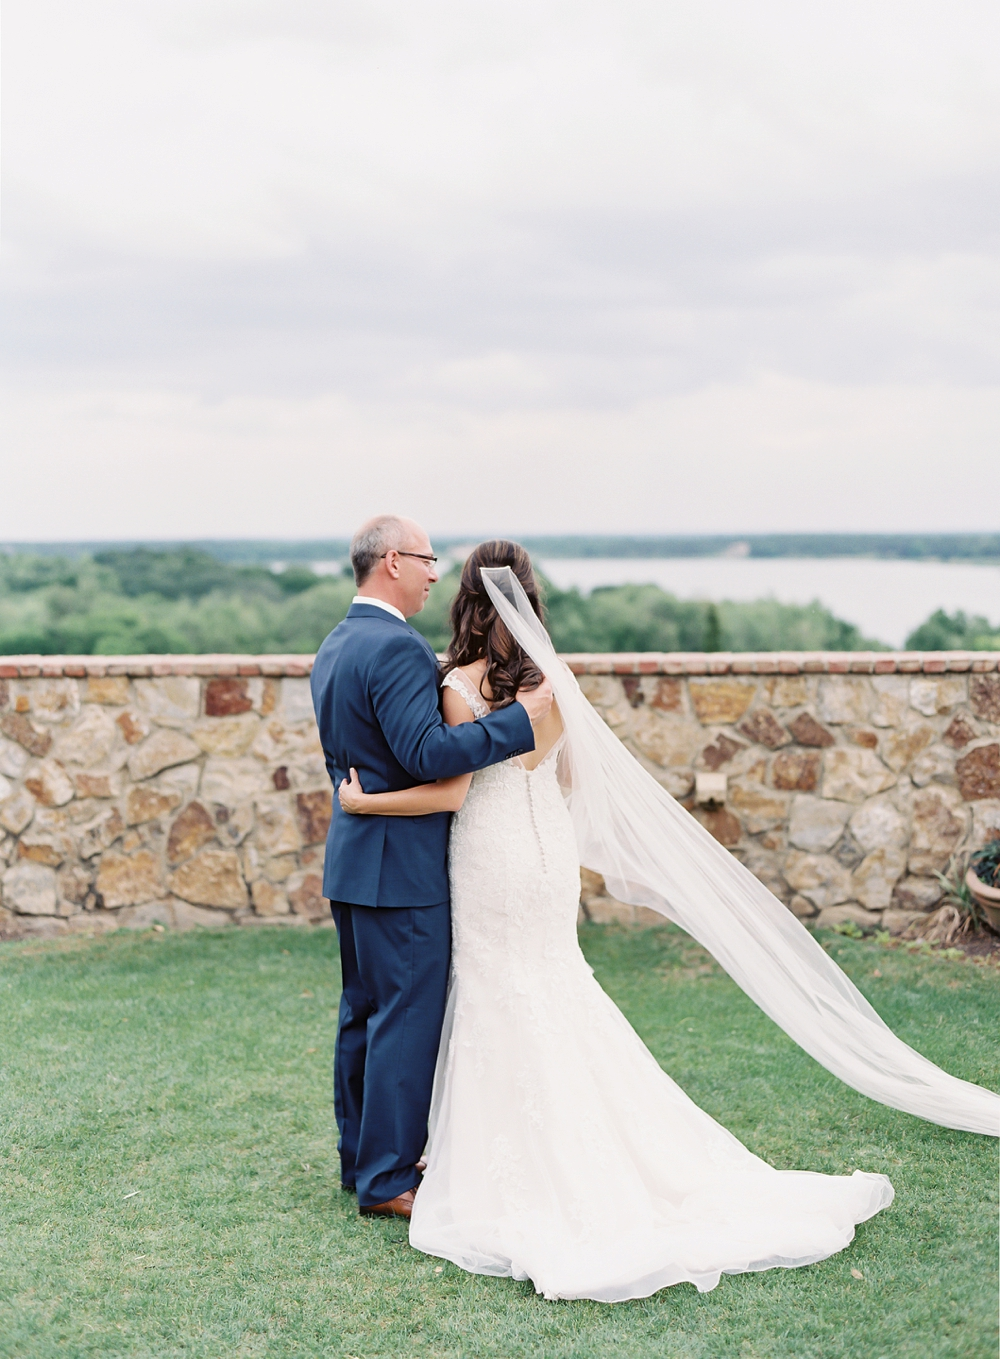 Vicki+Grafton+Photography+-+Fine+Art+Film+Wedding+Photographer+-+Bella+Collina+Wedding_0062.jpg